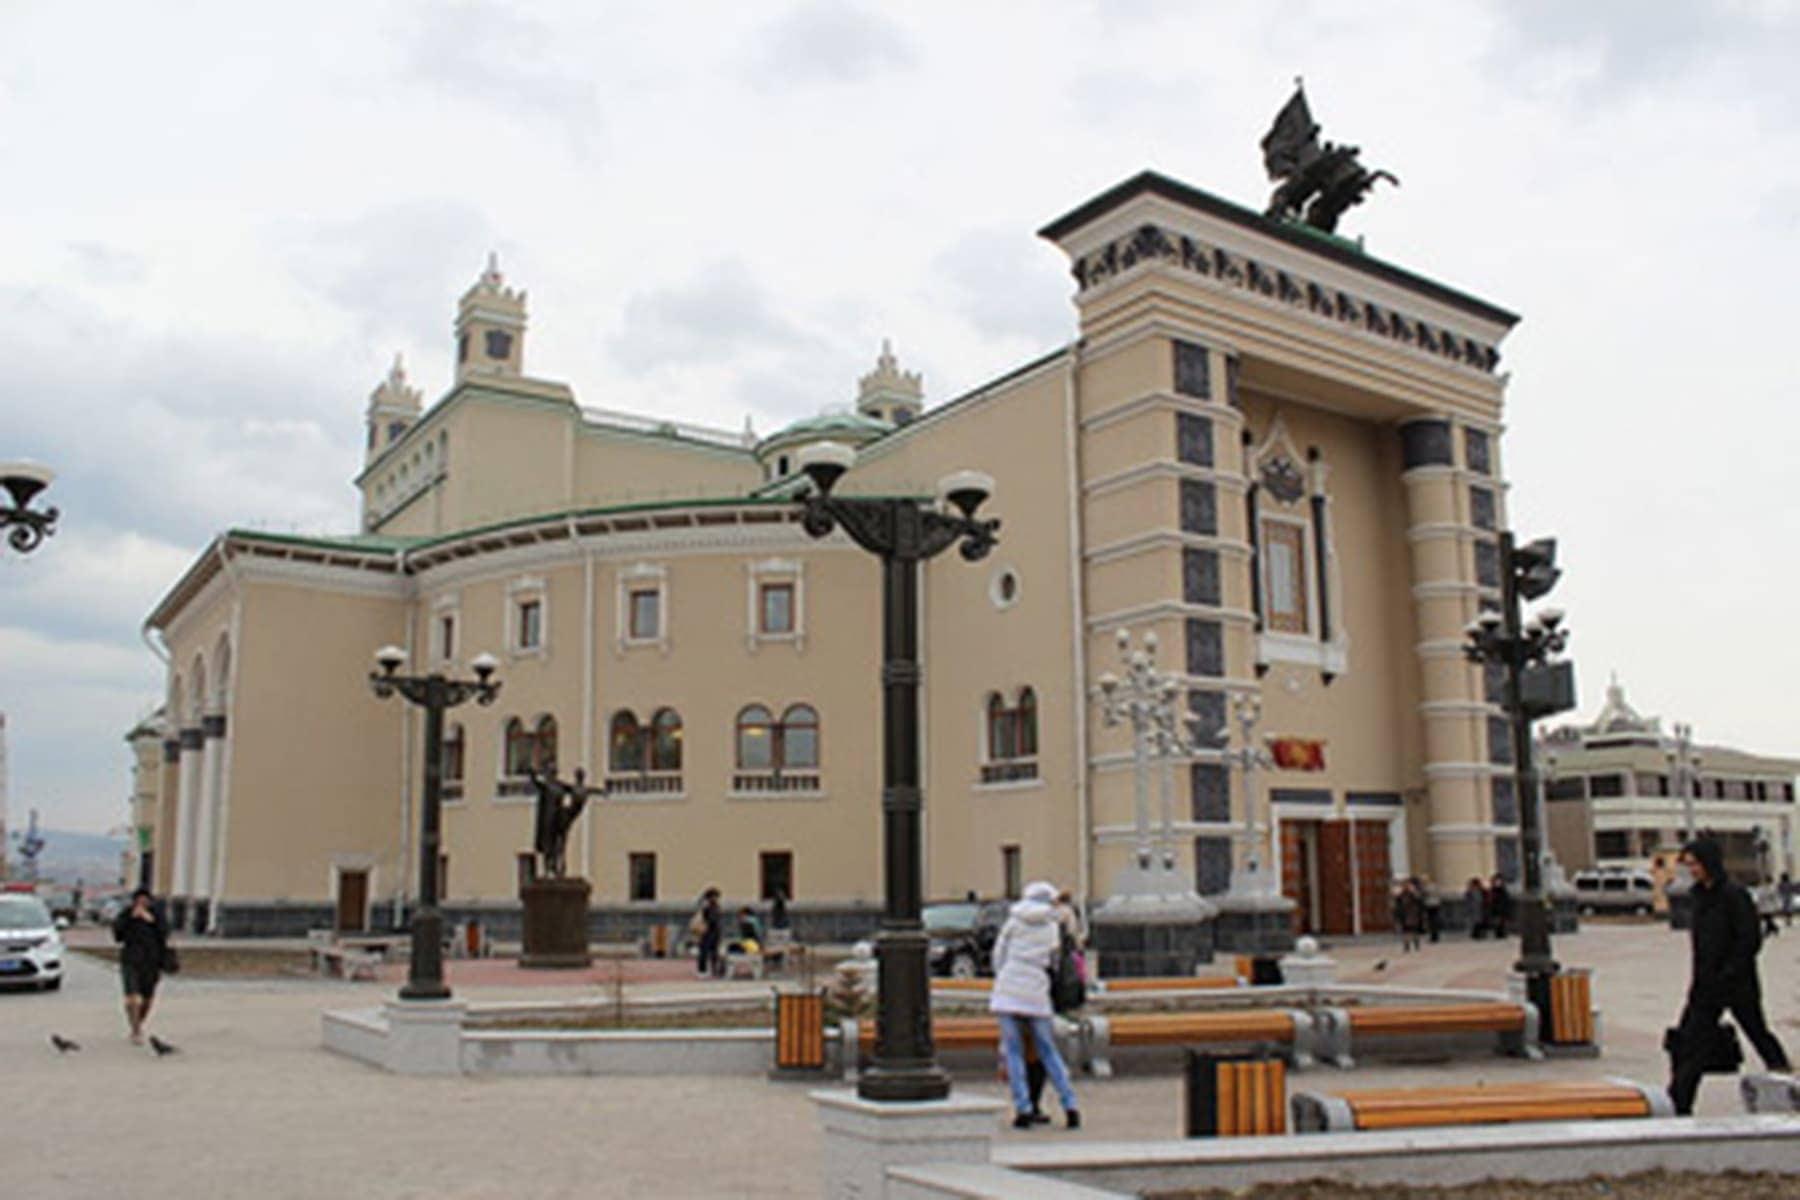 Бурятский театр оперы и балета. Фото - Аркадий Зарубин